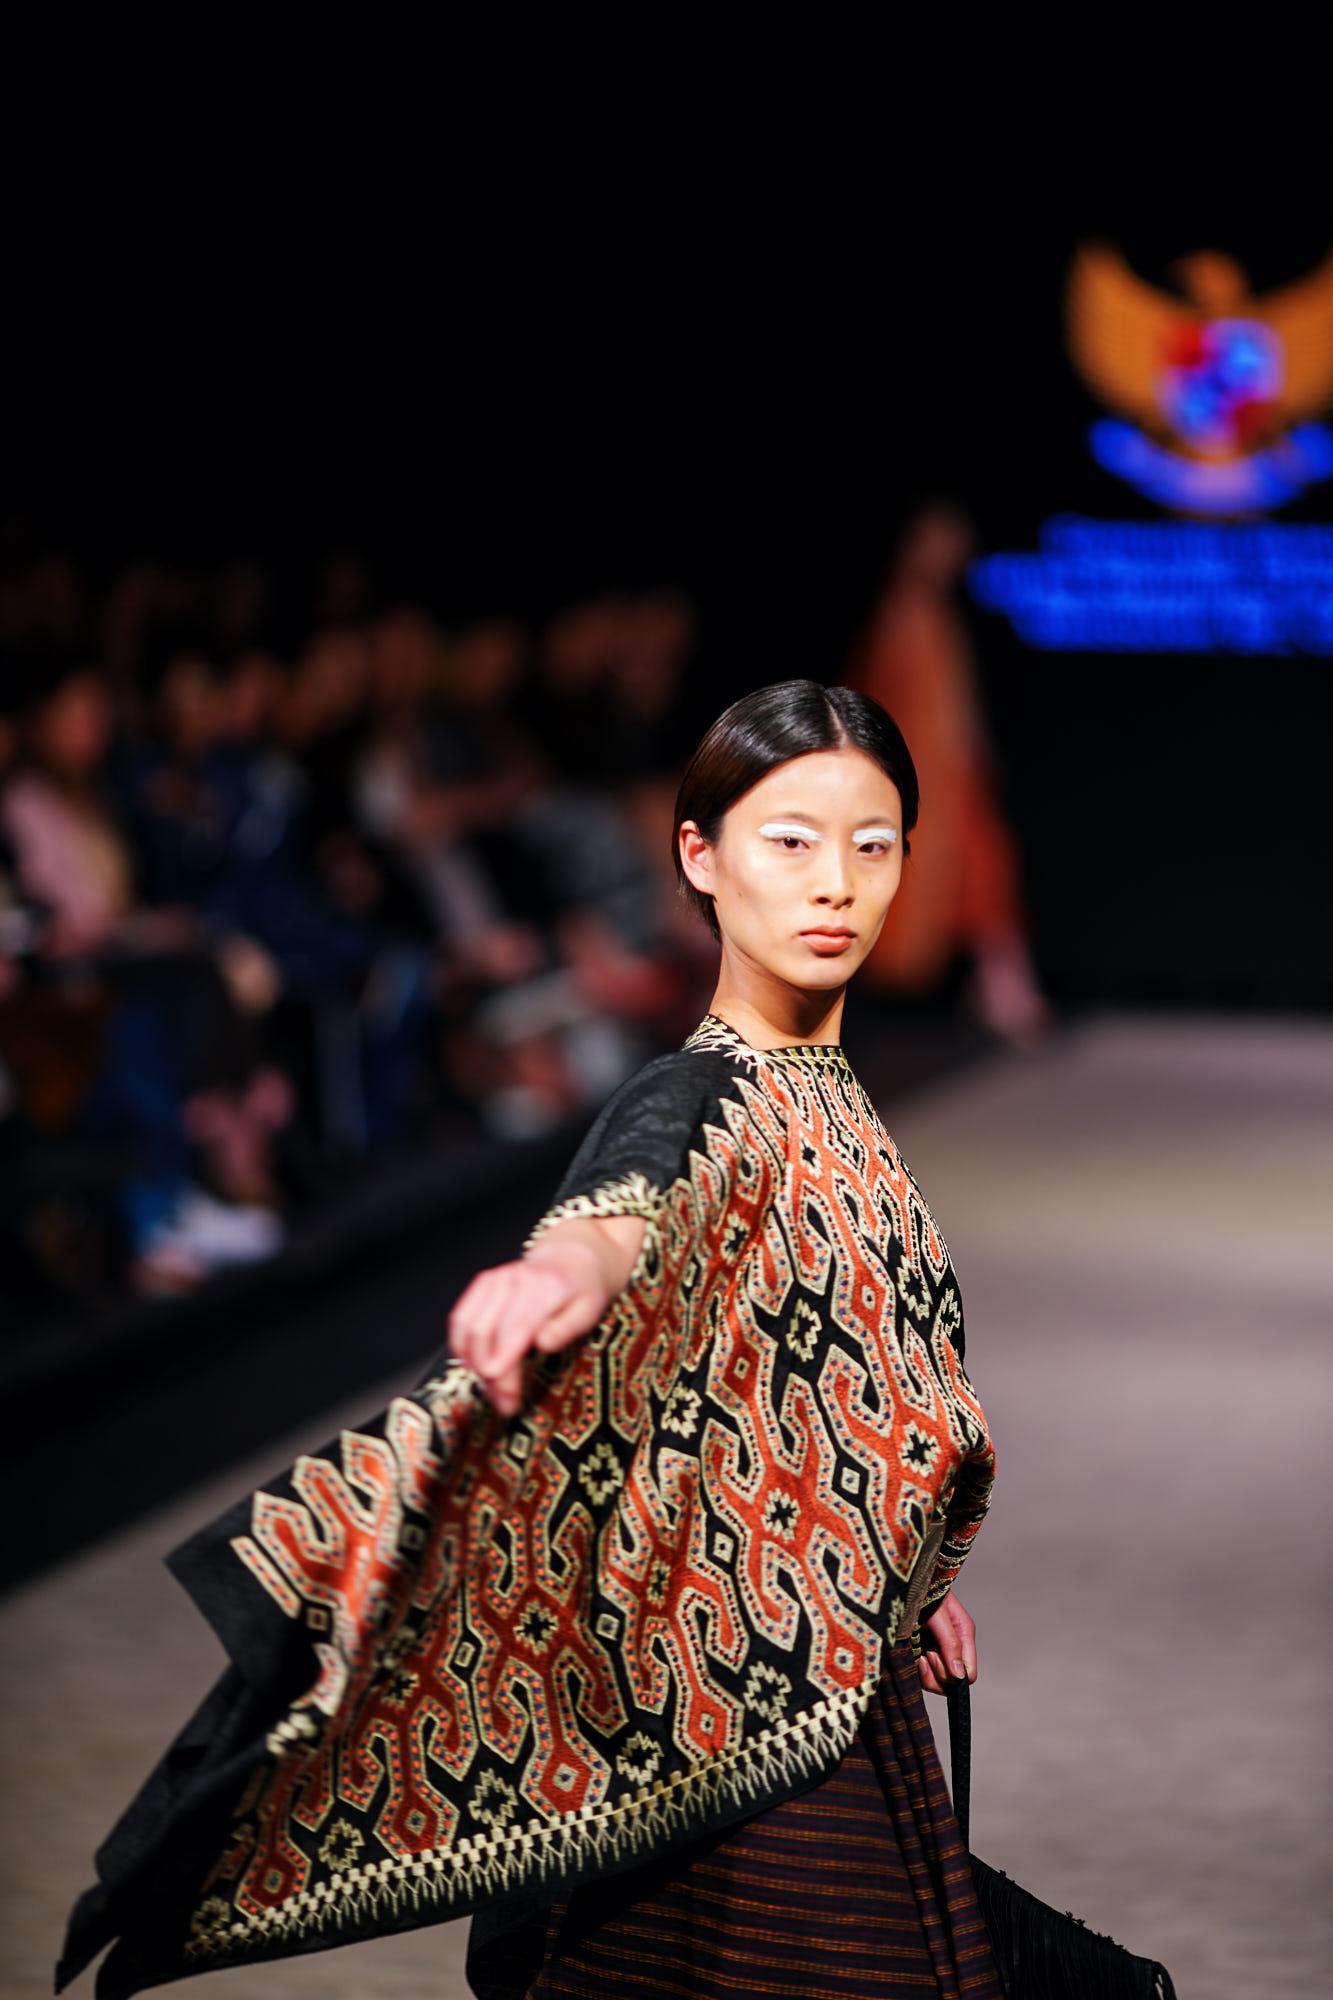 Lex & Josh Vancouver Fashion Week 2019 149.jpg